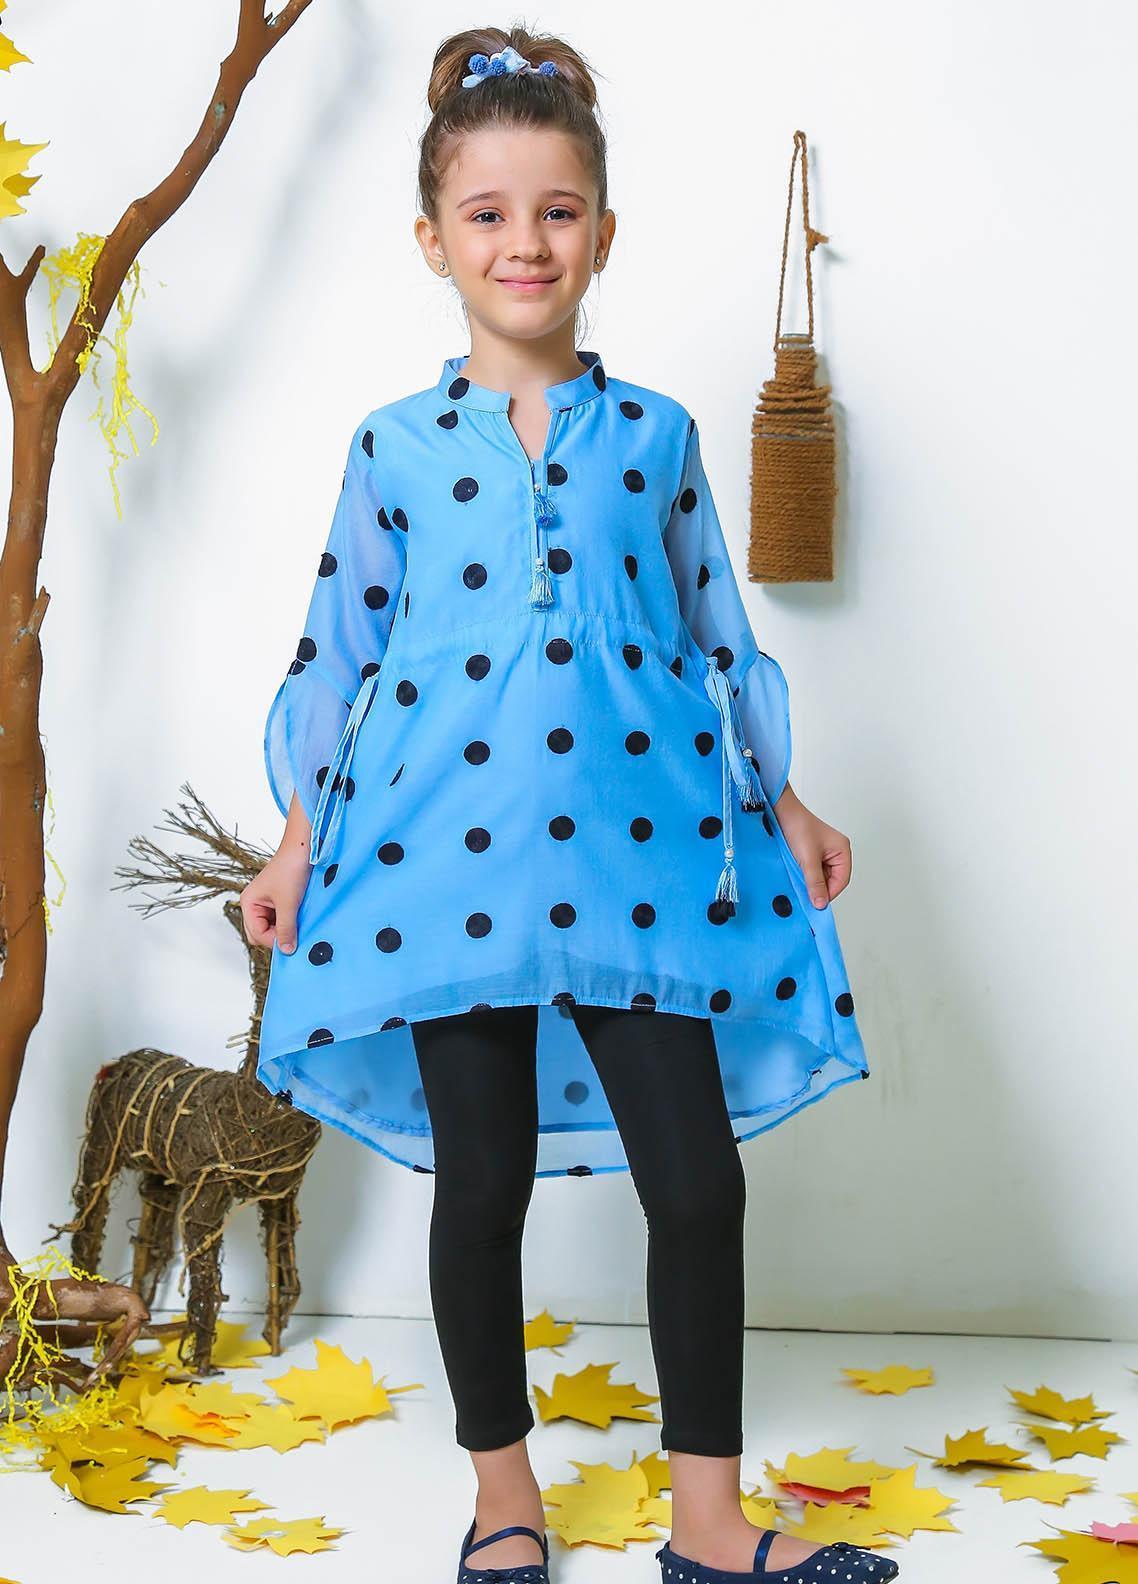 Ochre Silk Fancy Kurtis for Girls -  OFK 736 Blue